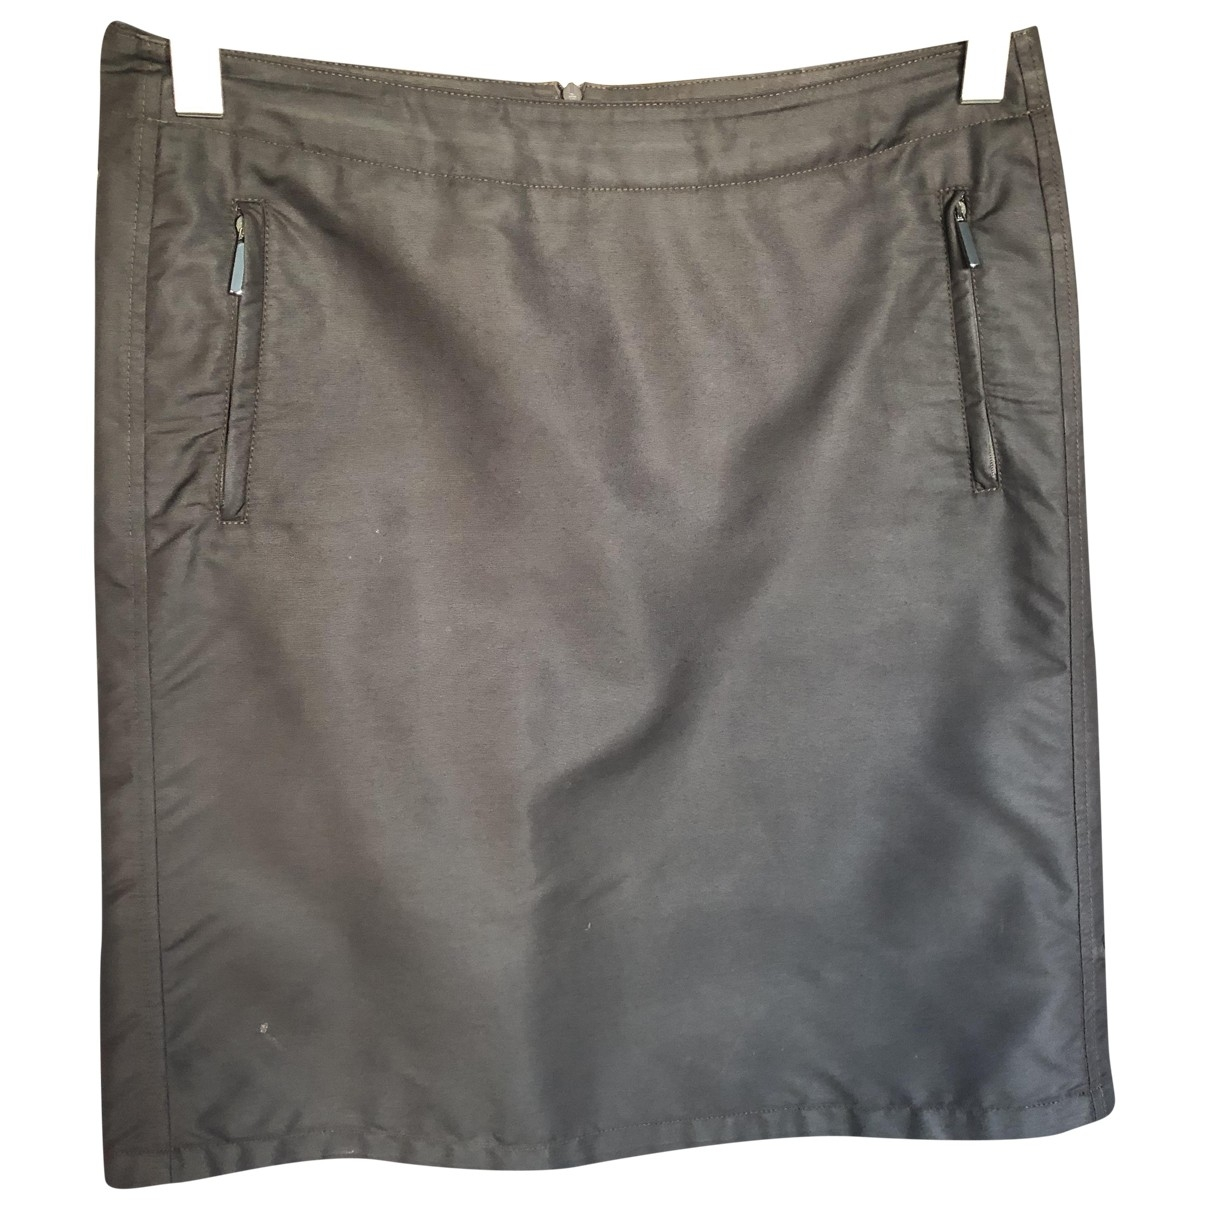 Mini falda Max Mara 's